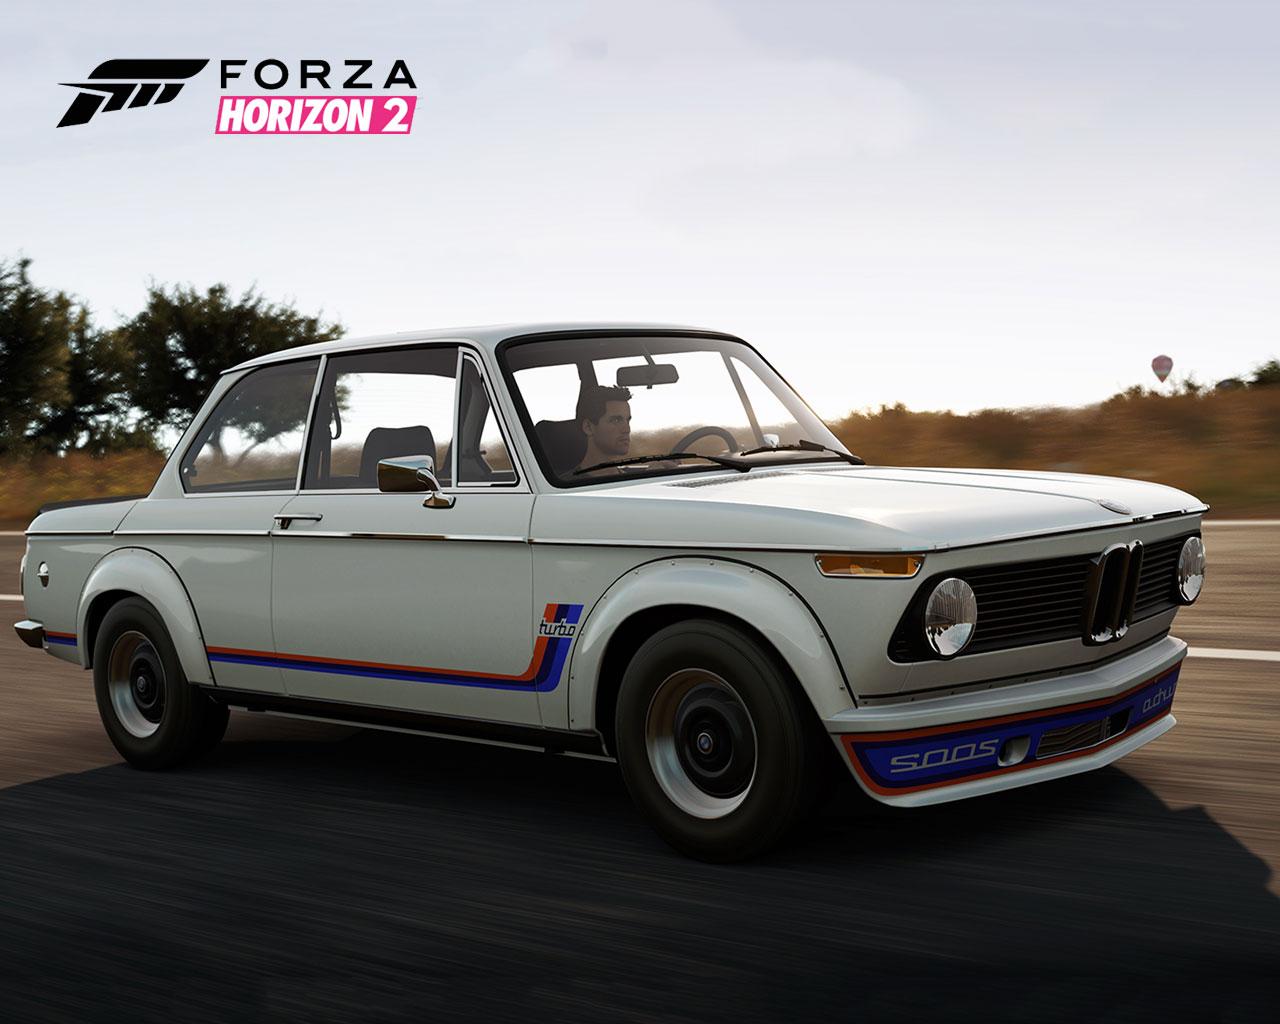 Free Forza Horizon 2 Wallpaper in 1280x1024